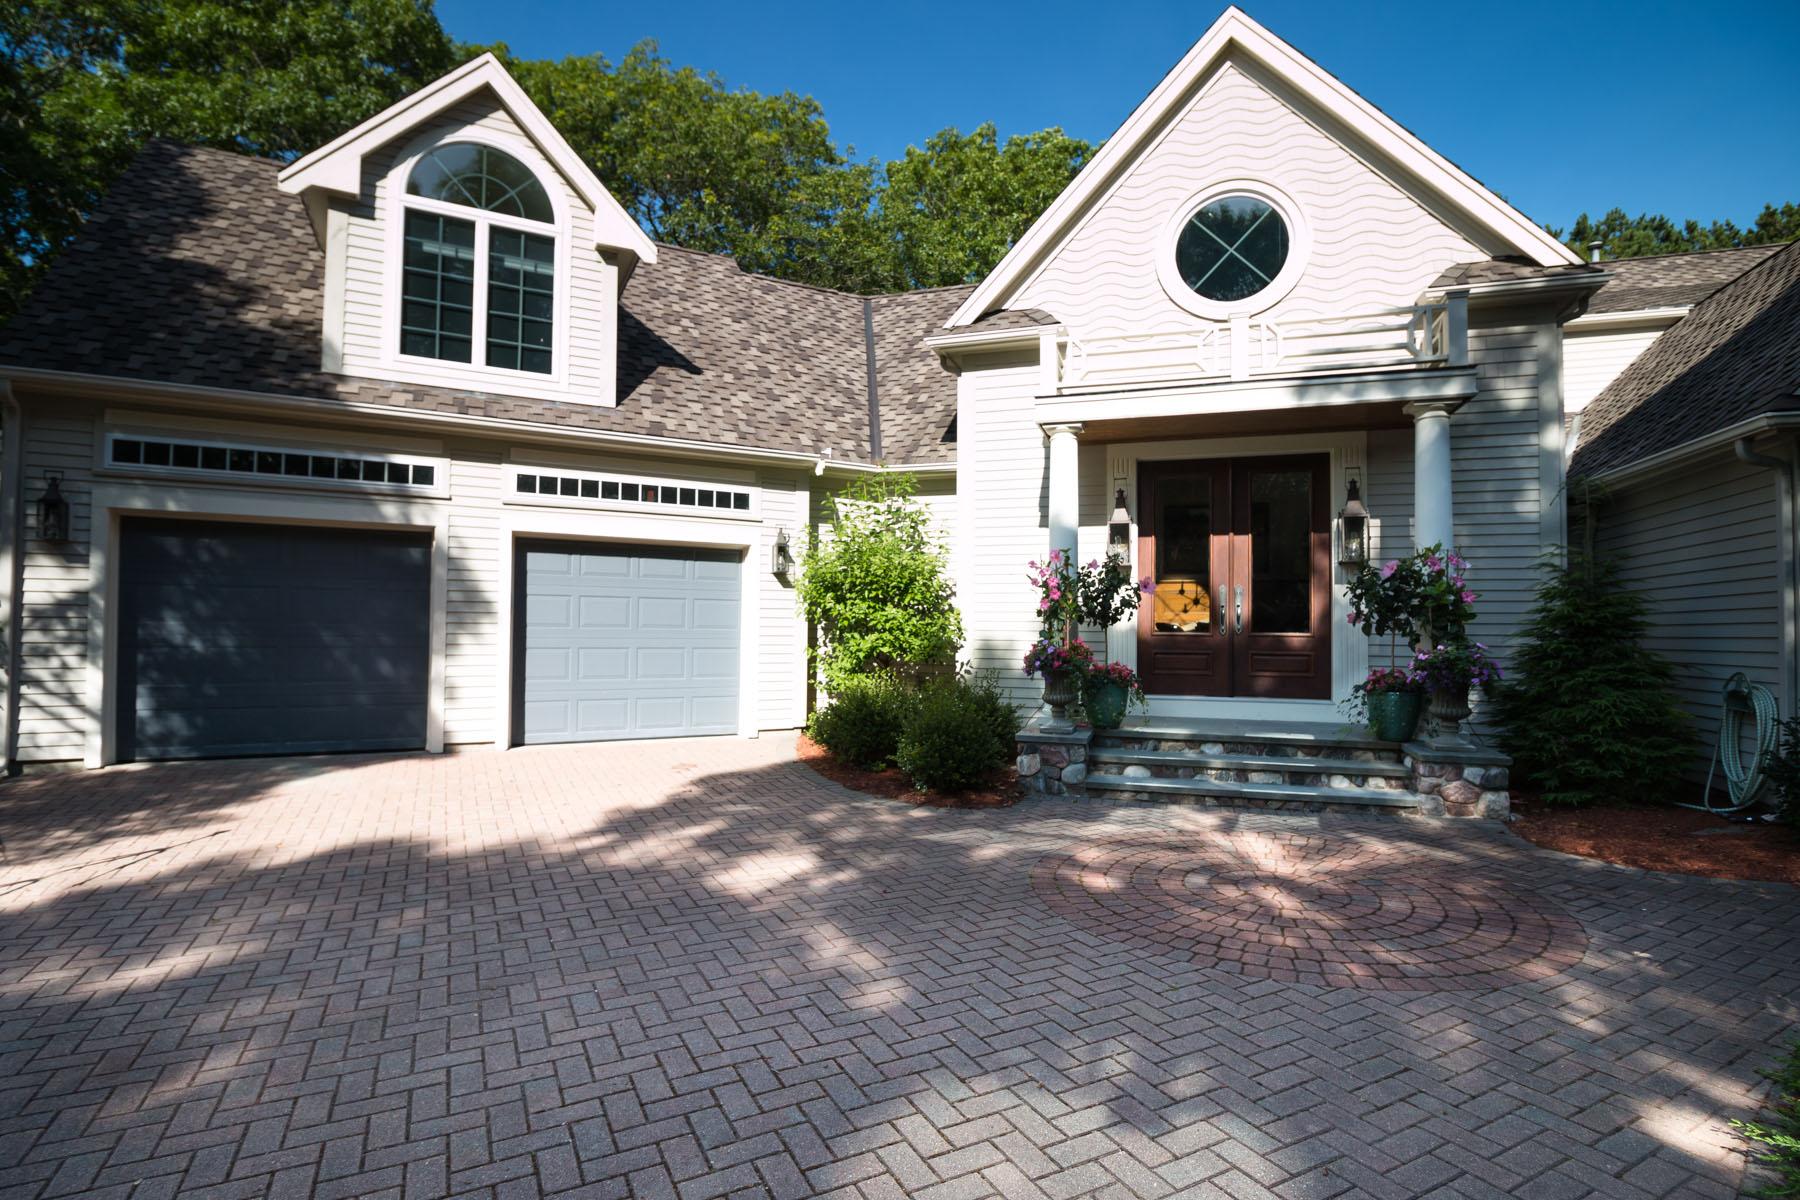 Villa per Vendita alle ore EXQUISITE CUSTOM BUILT HOME 98 Waterline Drive South New Seabury, Massachusetts, 02649 Stati UnitiIn/In giro: Mashpee